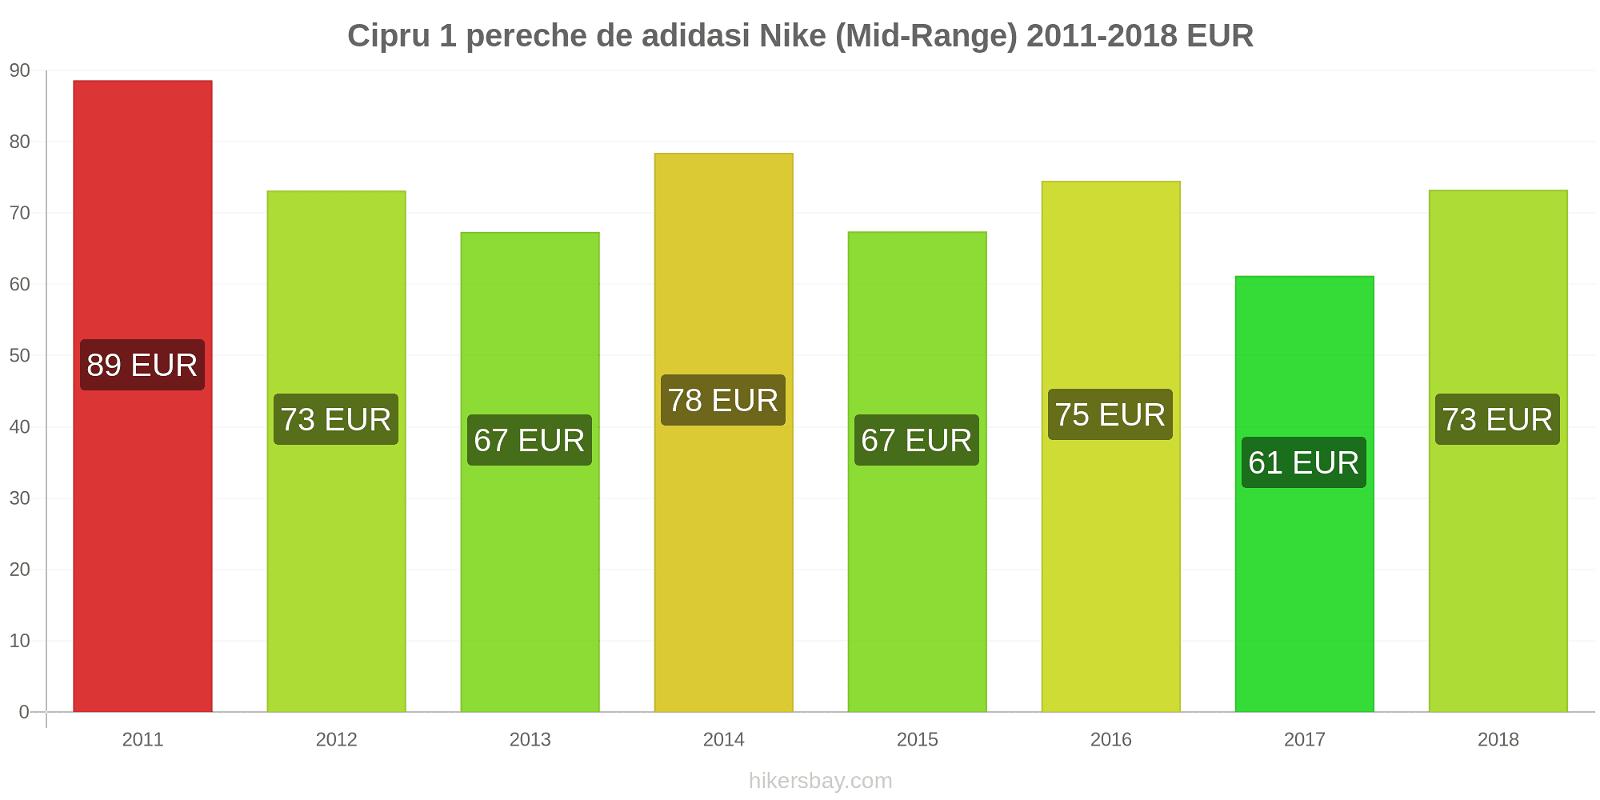 Cipru modificări de preț 1 pereche de adidasi Nike (Mid-Range) hikersbay.com